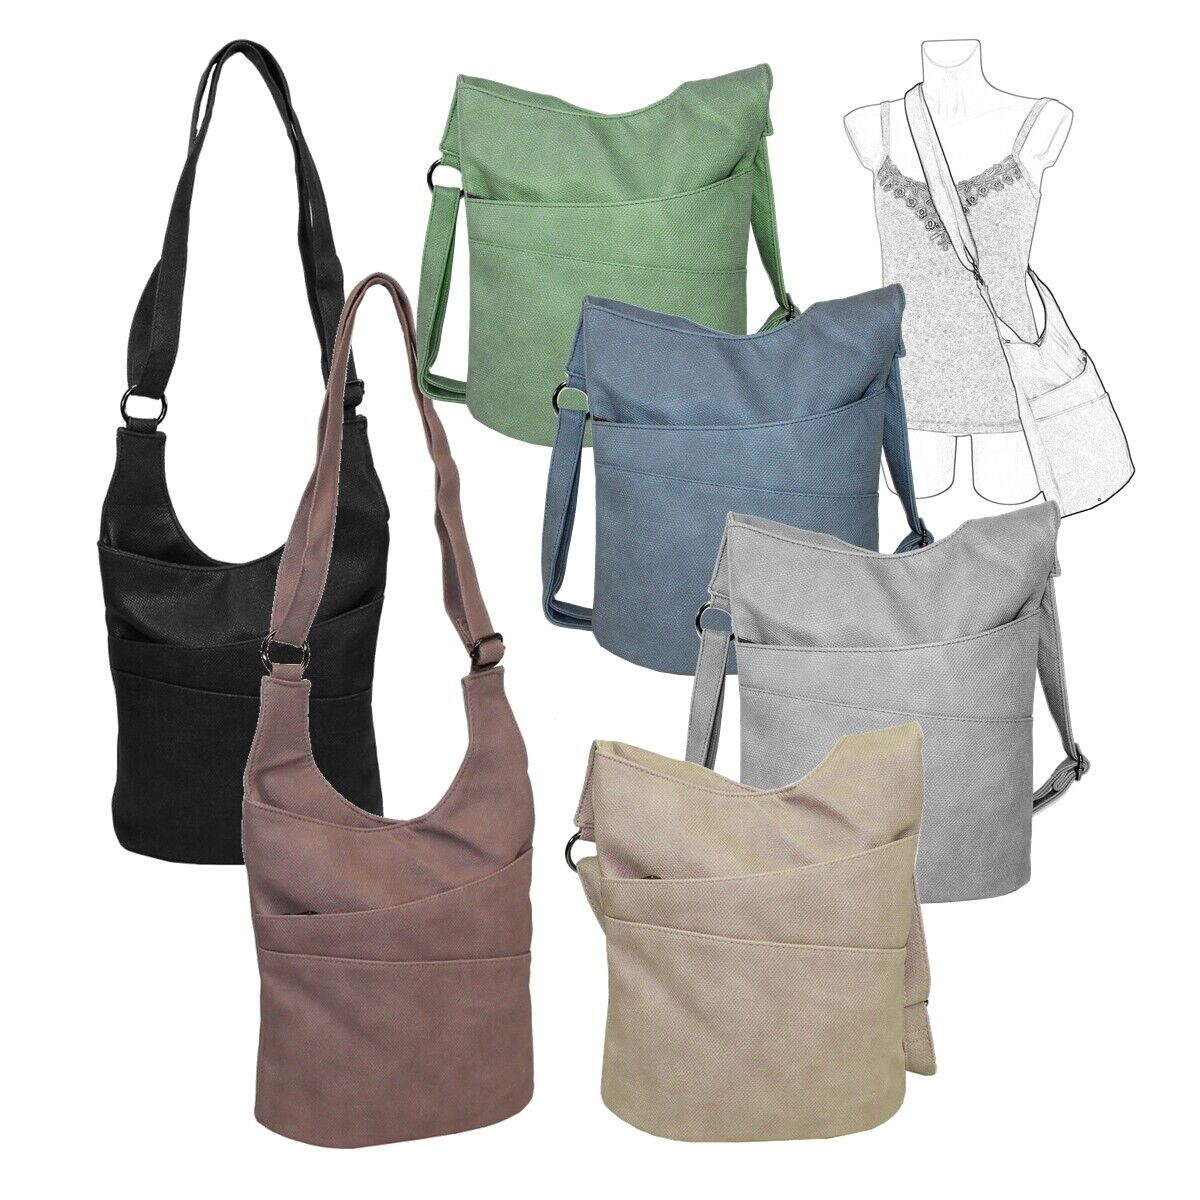 New Bags Damen Umhängetasche Struktur Hobo Crossbag Beuteltasche Handtasche